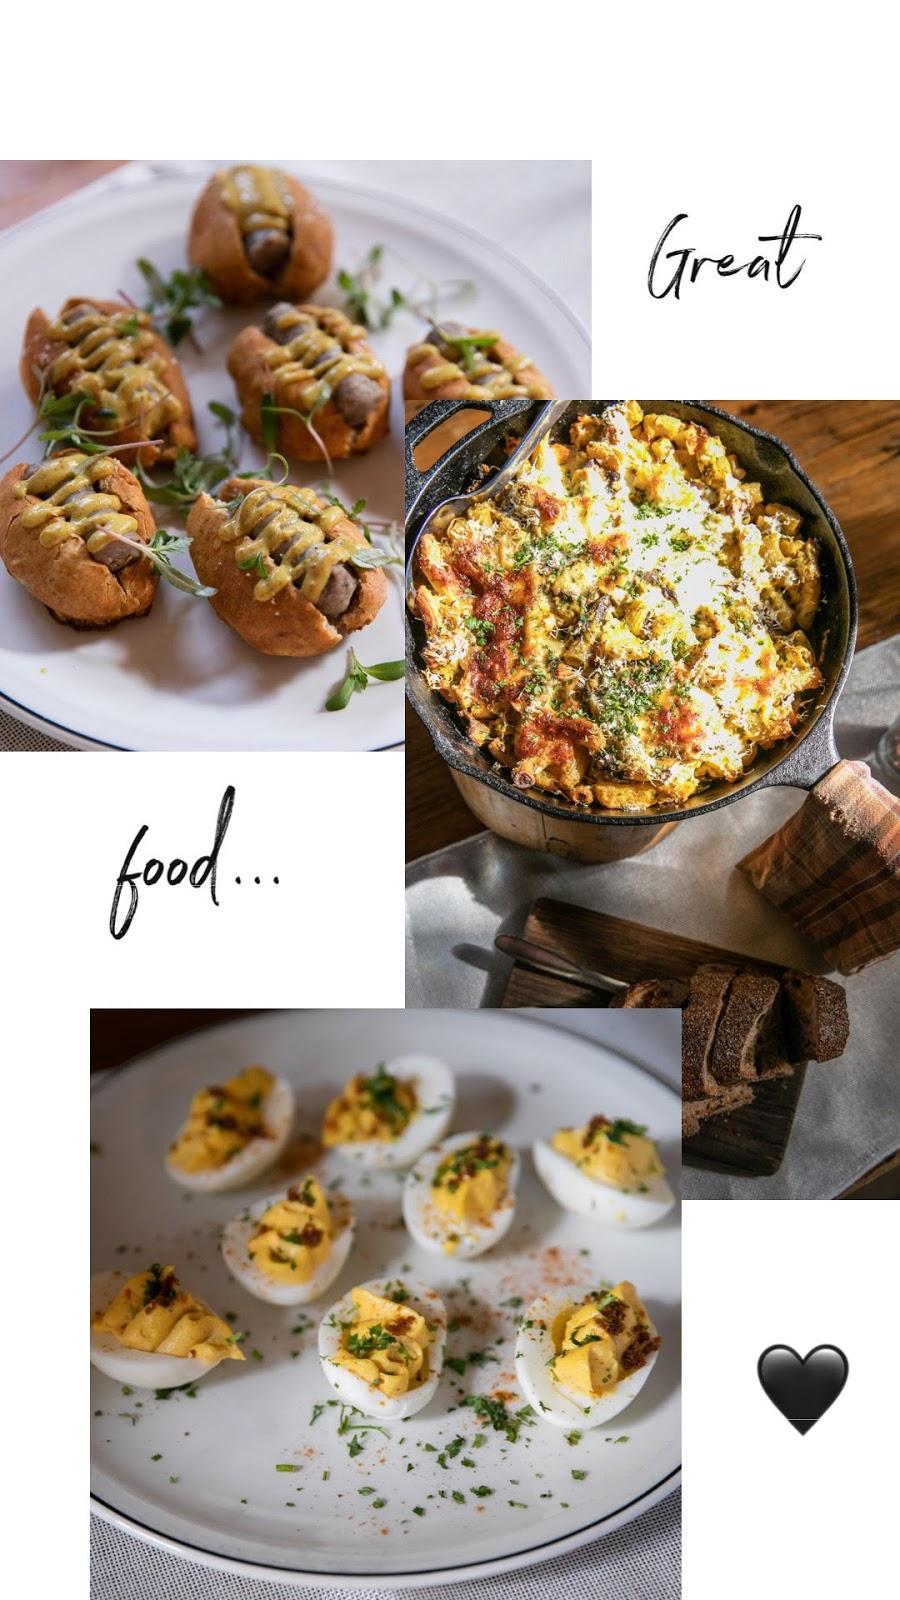 Stella-Adewunmi-of-Jadore-Fashion-share-woodberry-kitchen-food